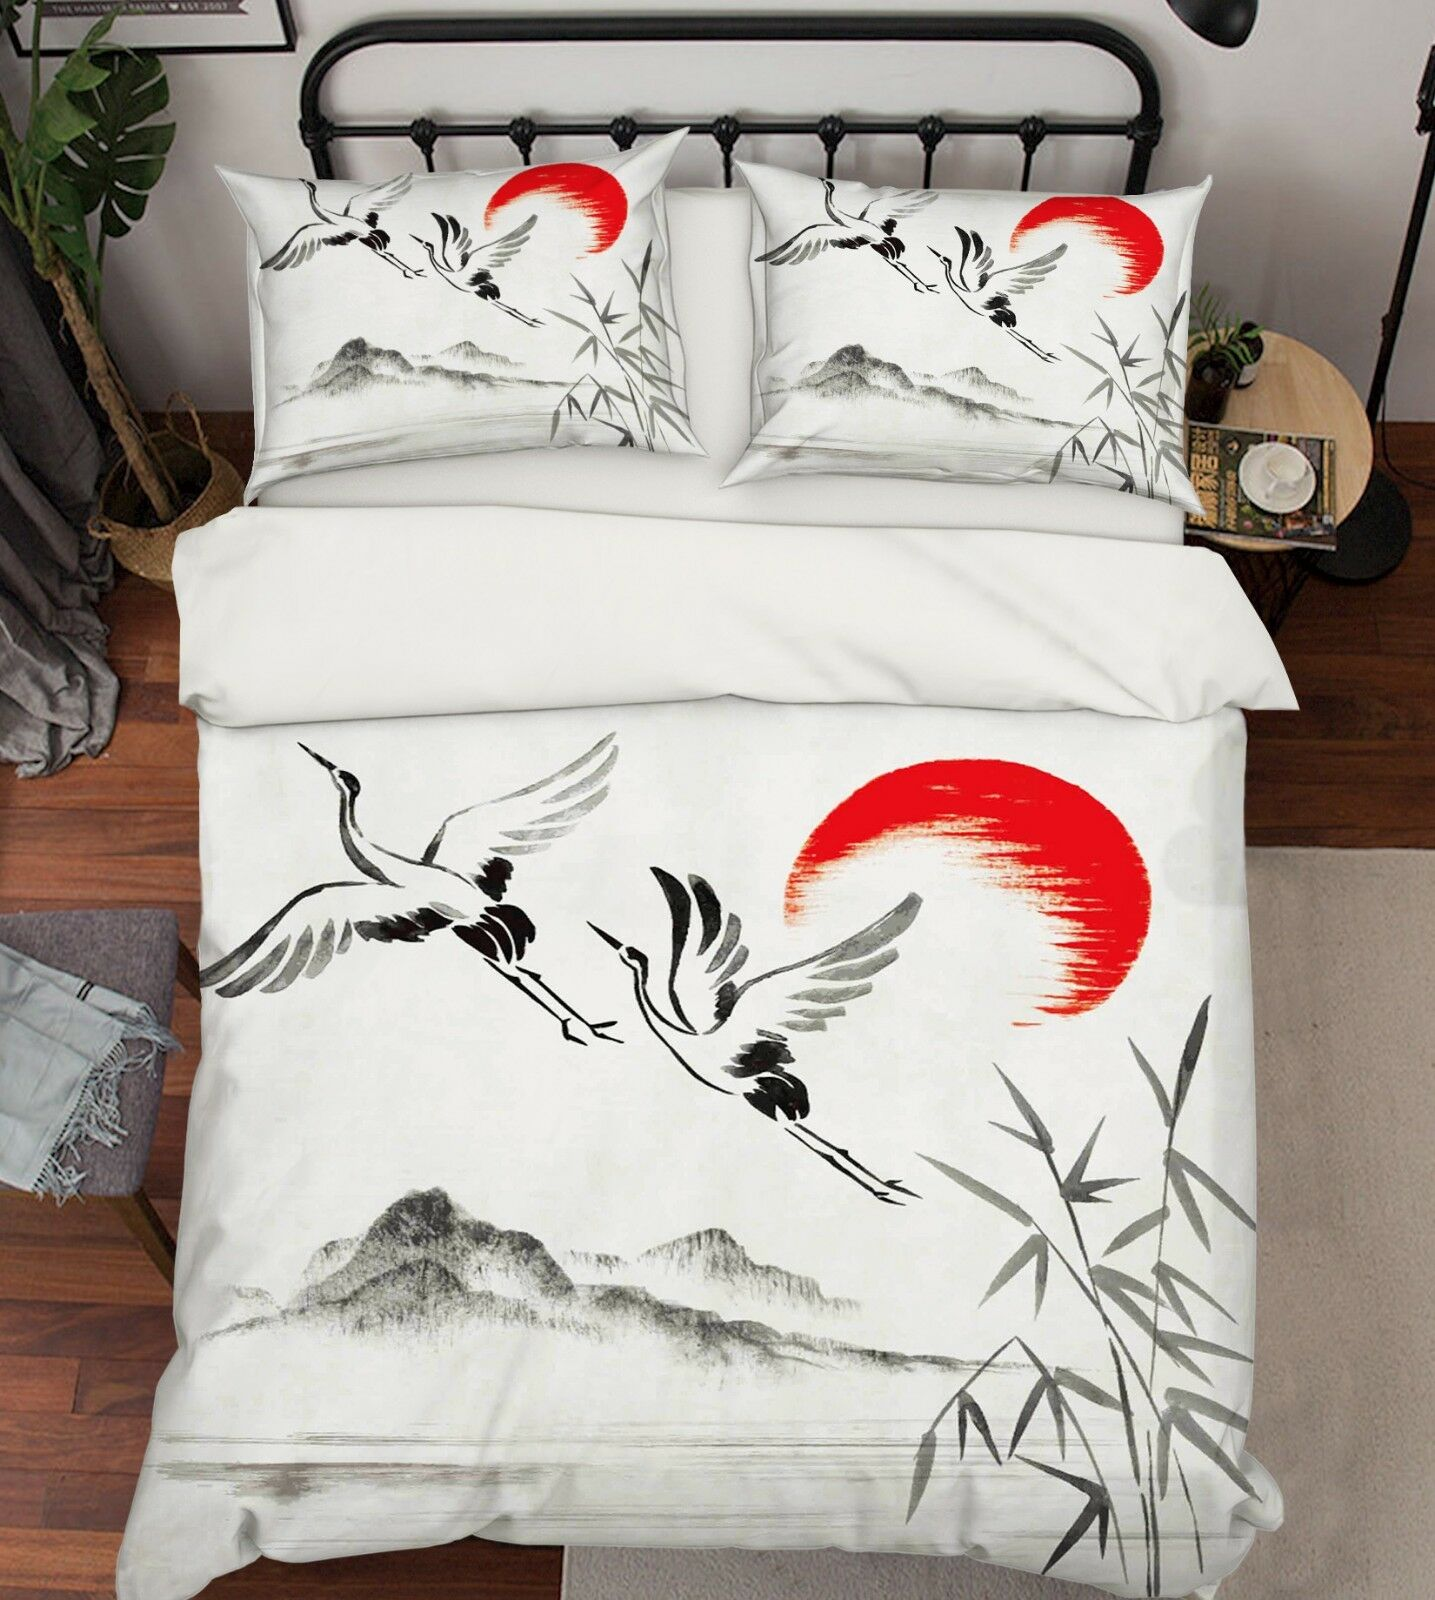 3D Sun Heron Reeds 7 Bed Pillowcases Quilt Duvet Cover Set Single King UK Summer